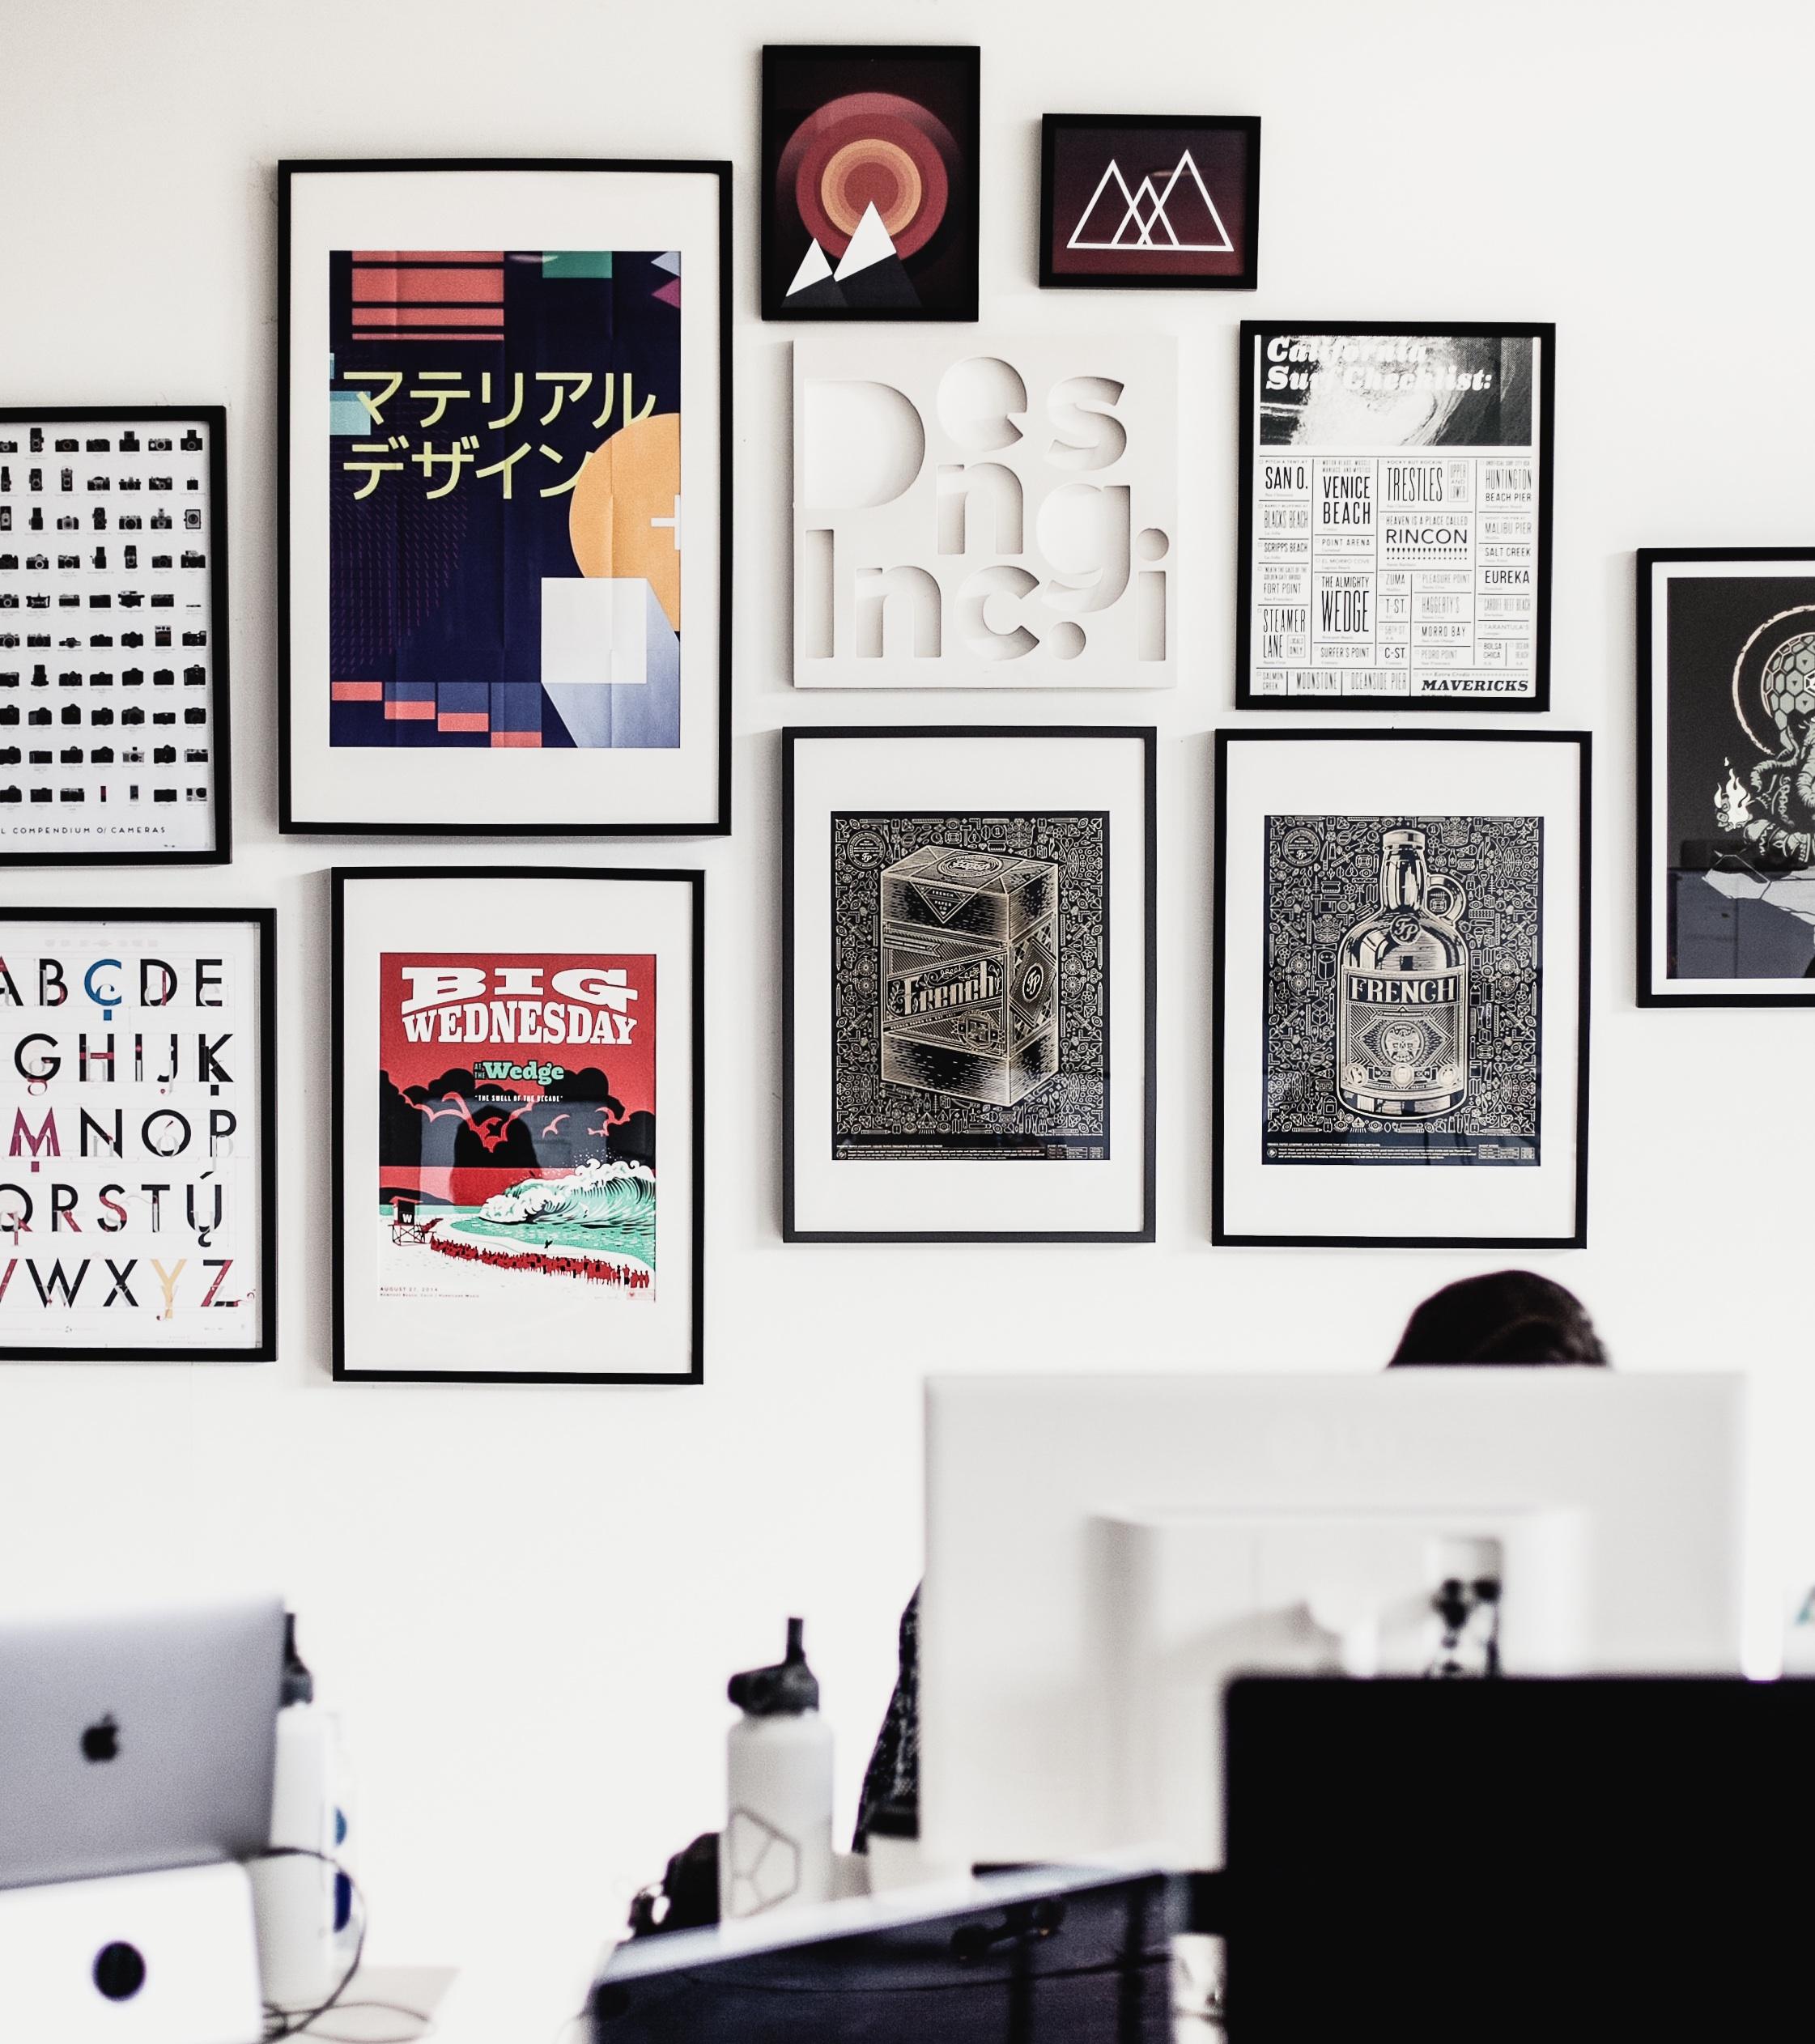 Mac Working Worke Office Brand Art Peson Ilration Design Picture Frame Modern